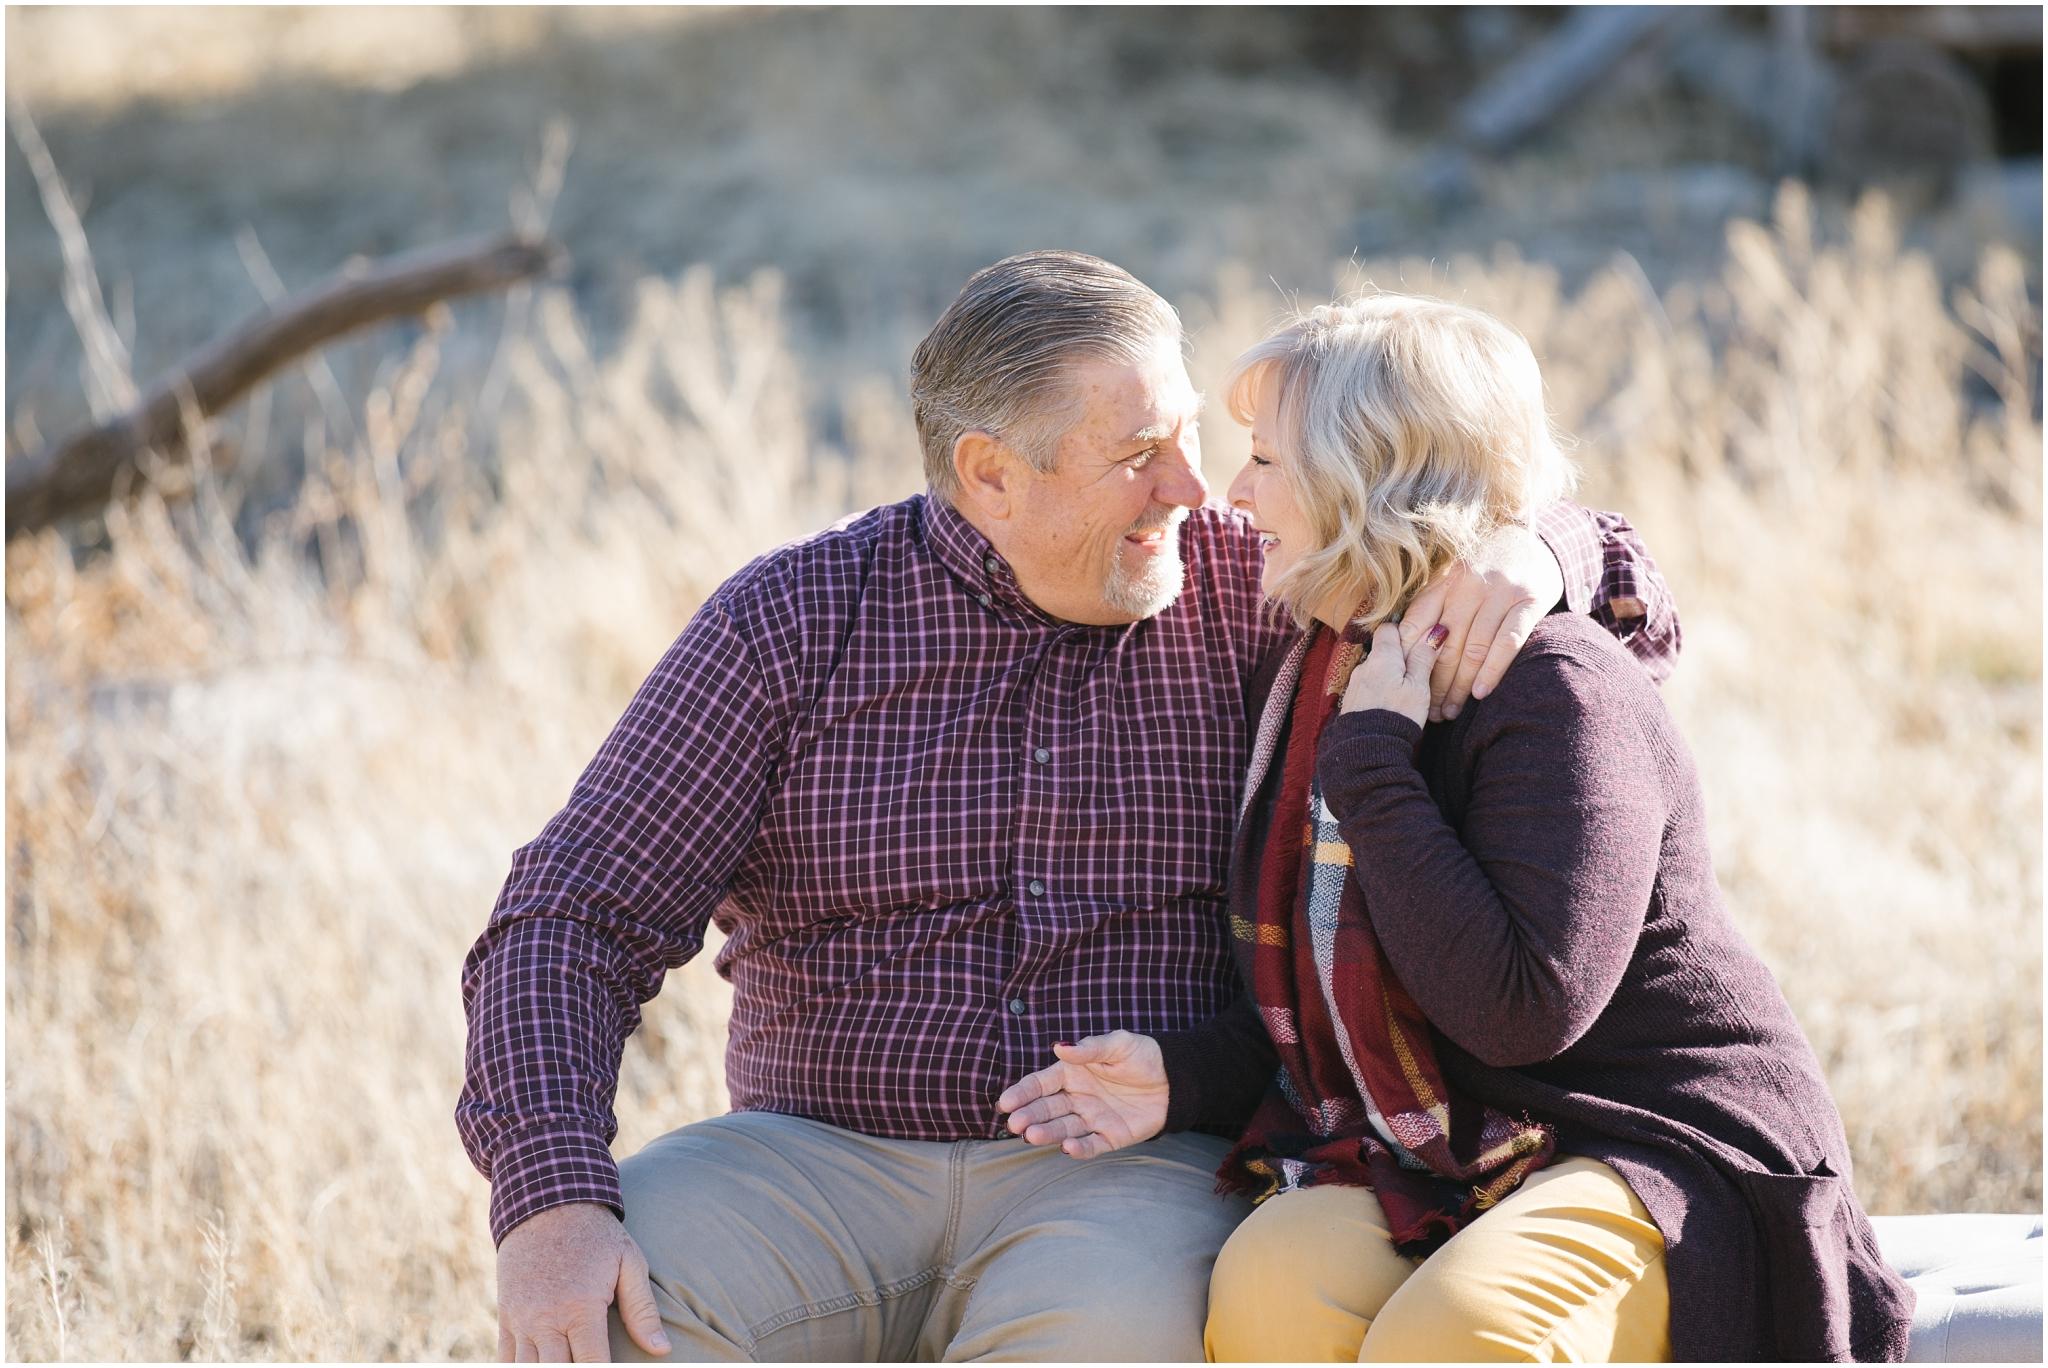 Laws-34_Lizzie-B-Imagery-Utah-Family-Photographer-Salt-Lake-City-Park-City-Davis-County-Clearfield.jpg